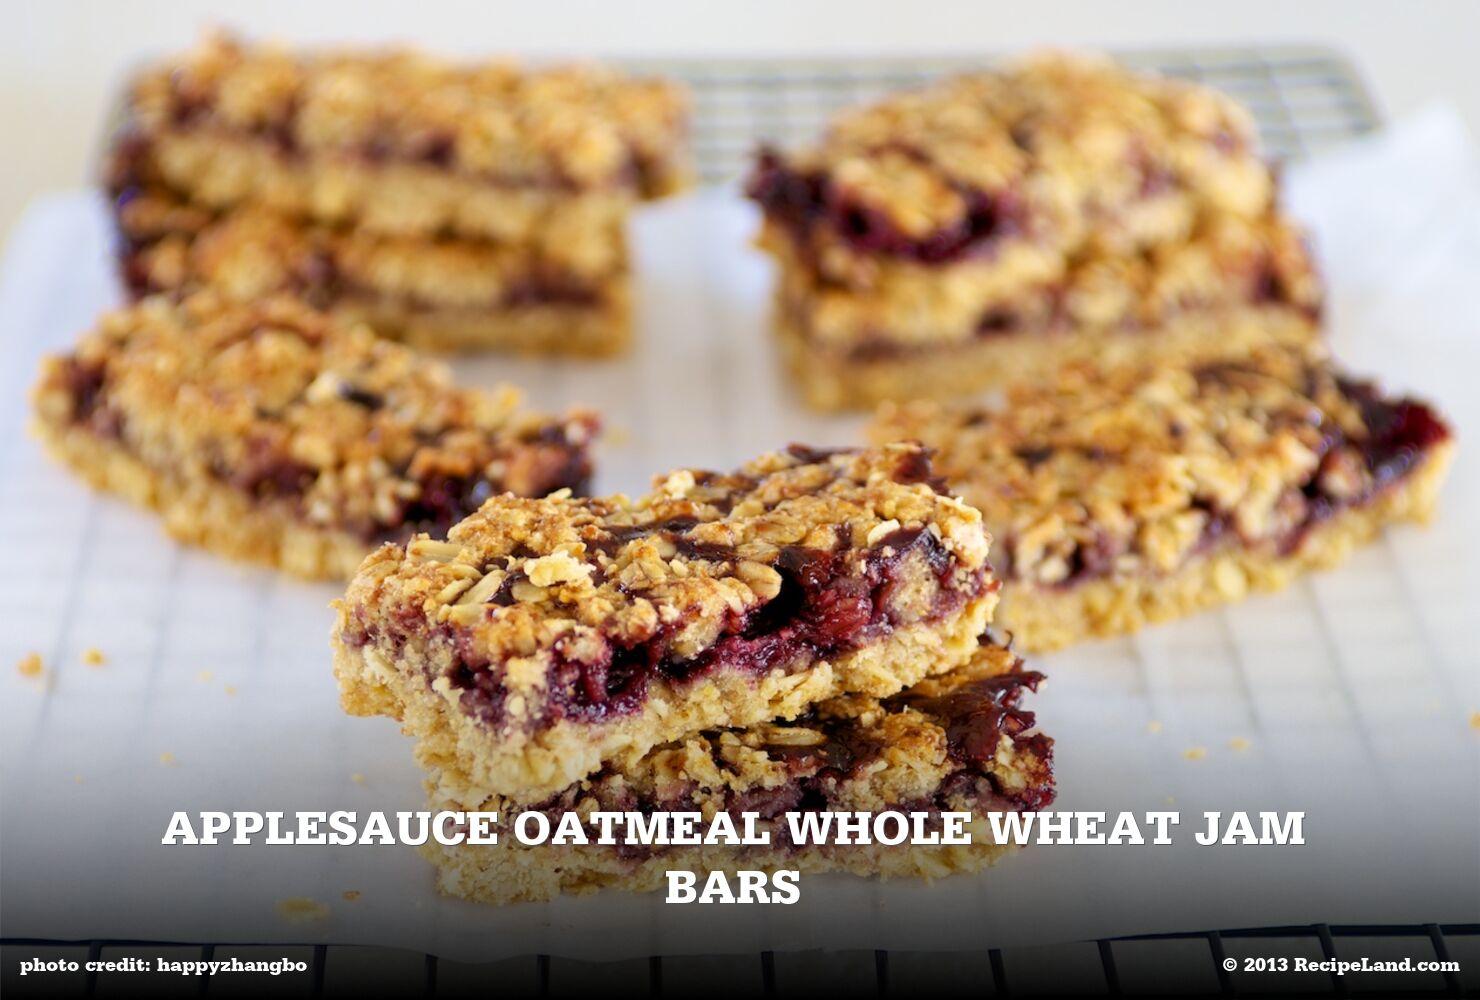 Applesauce Oatmeal Whole Wheat Jam Bars